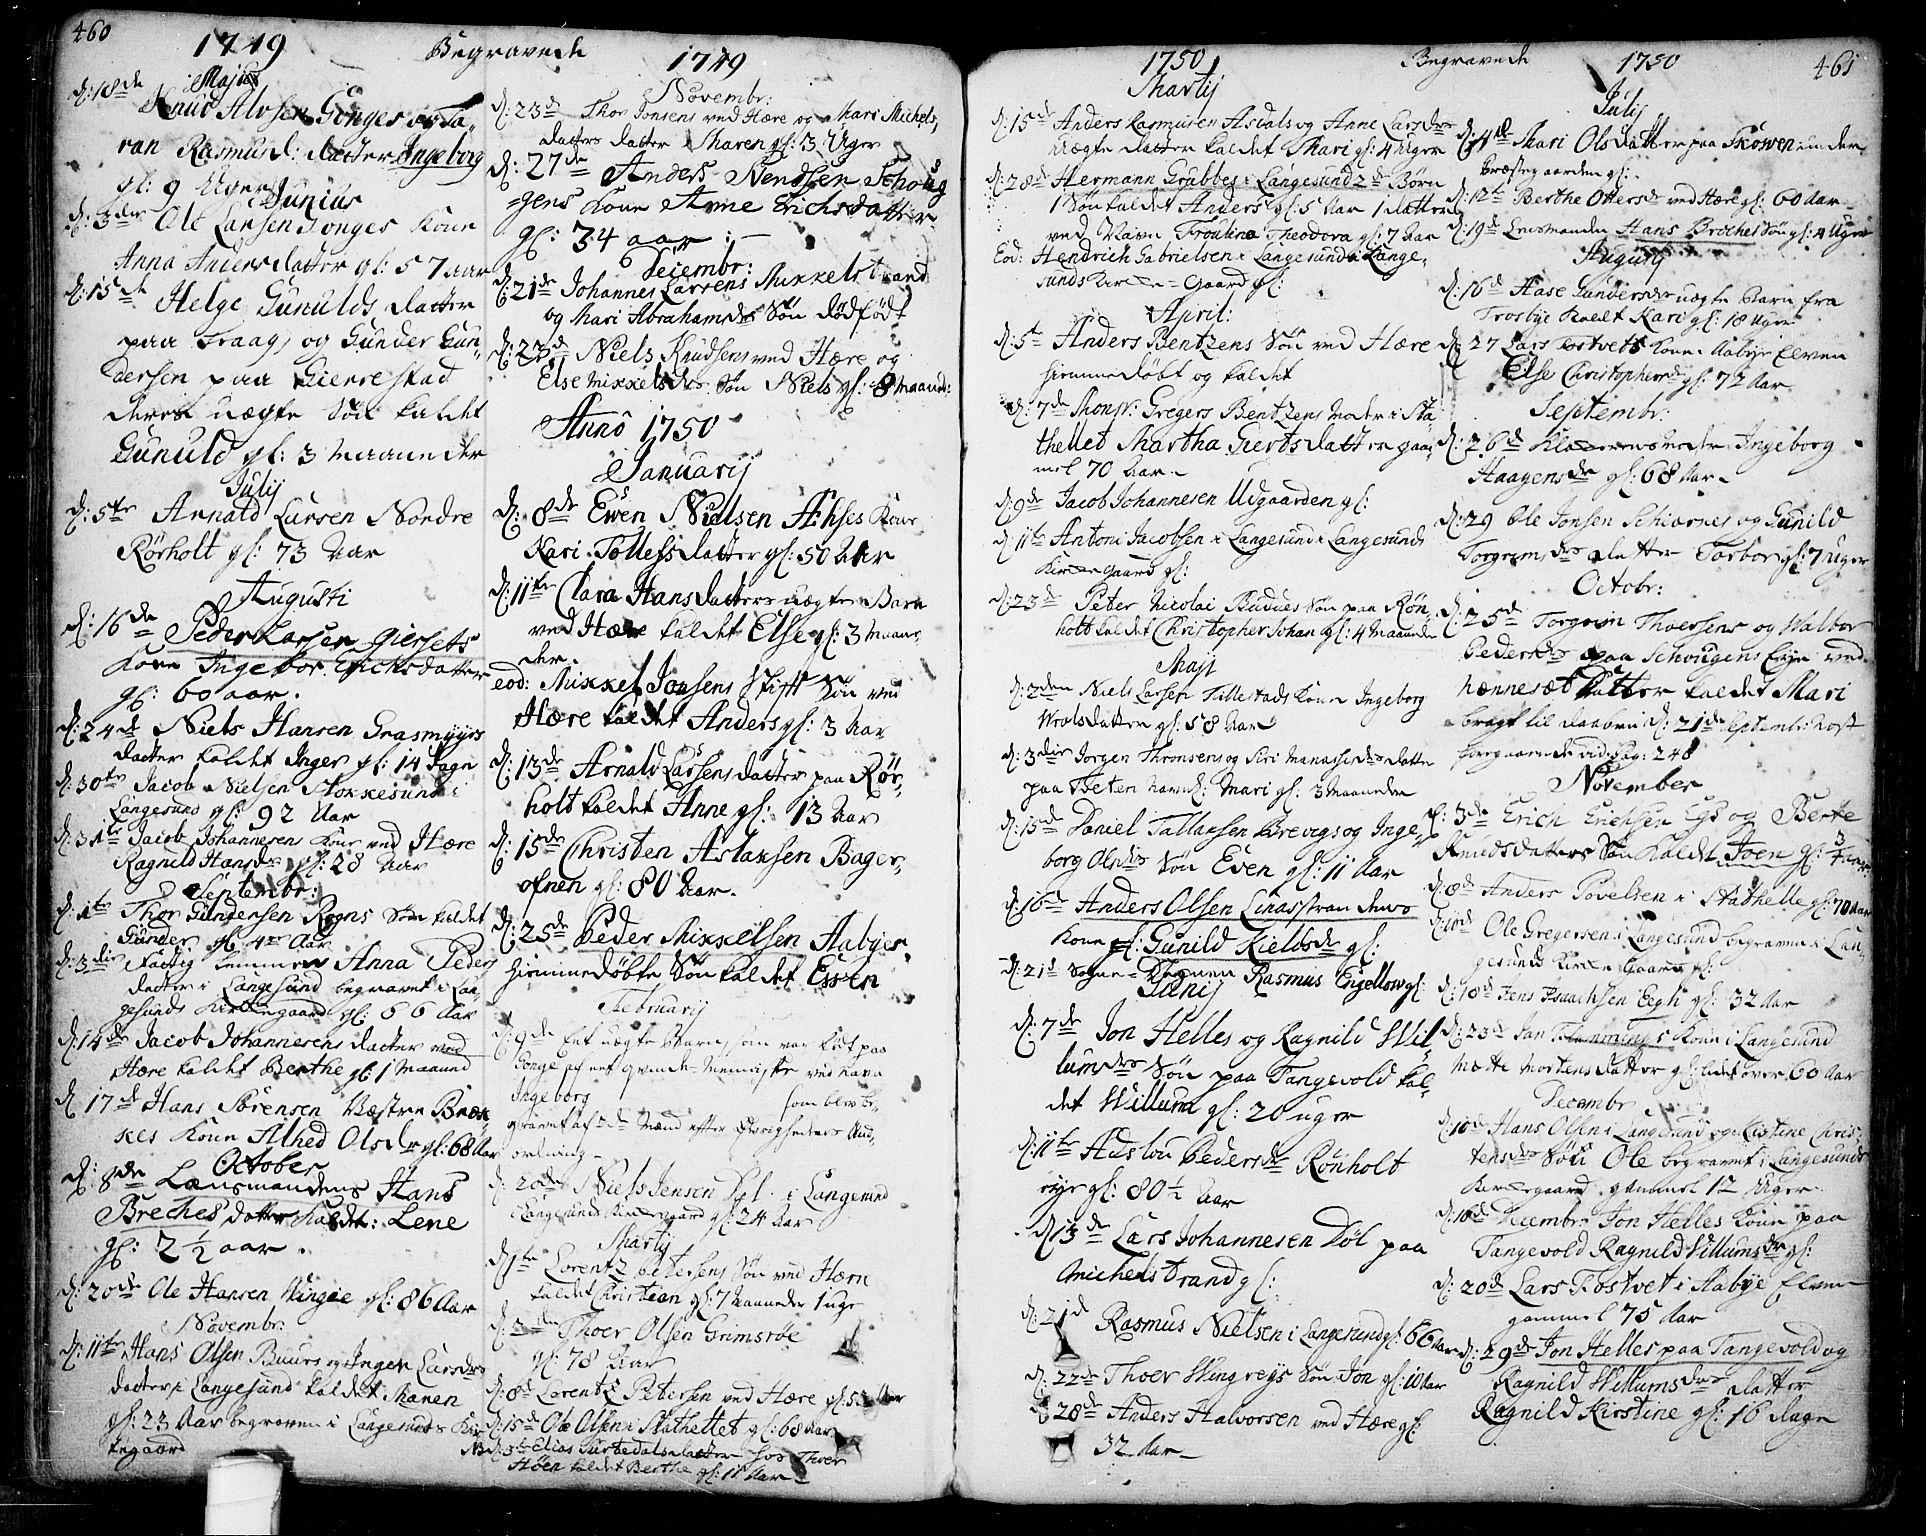 SAKO, Bamble kirkebøker, F/Fa/L0001: Ministerialbok nr. I 1, 1702-1774, s. 460-461